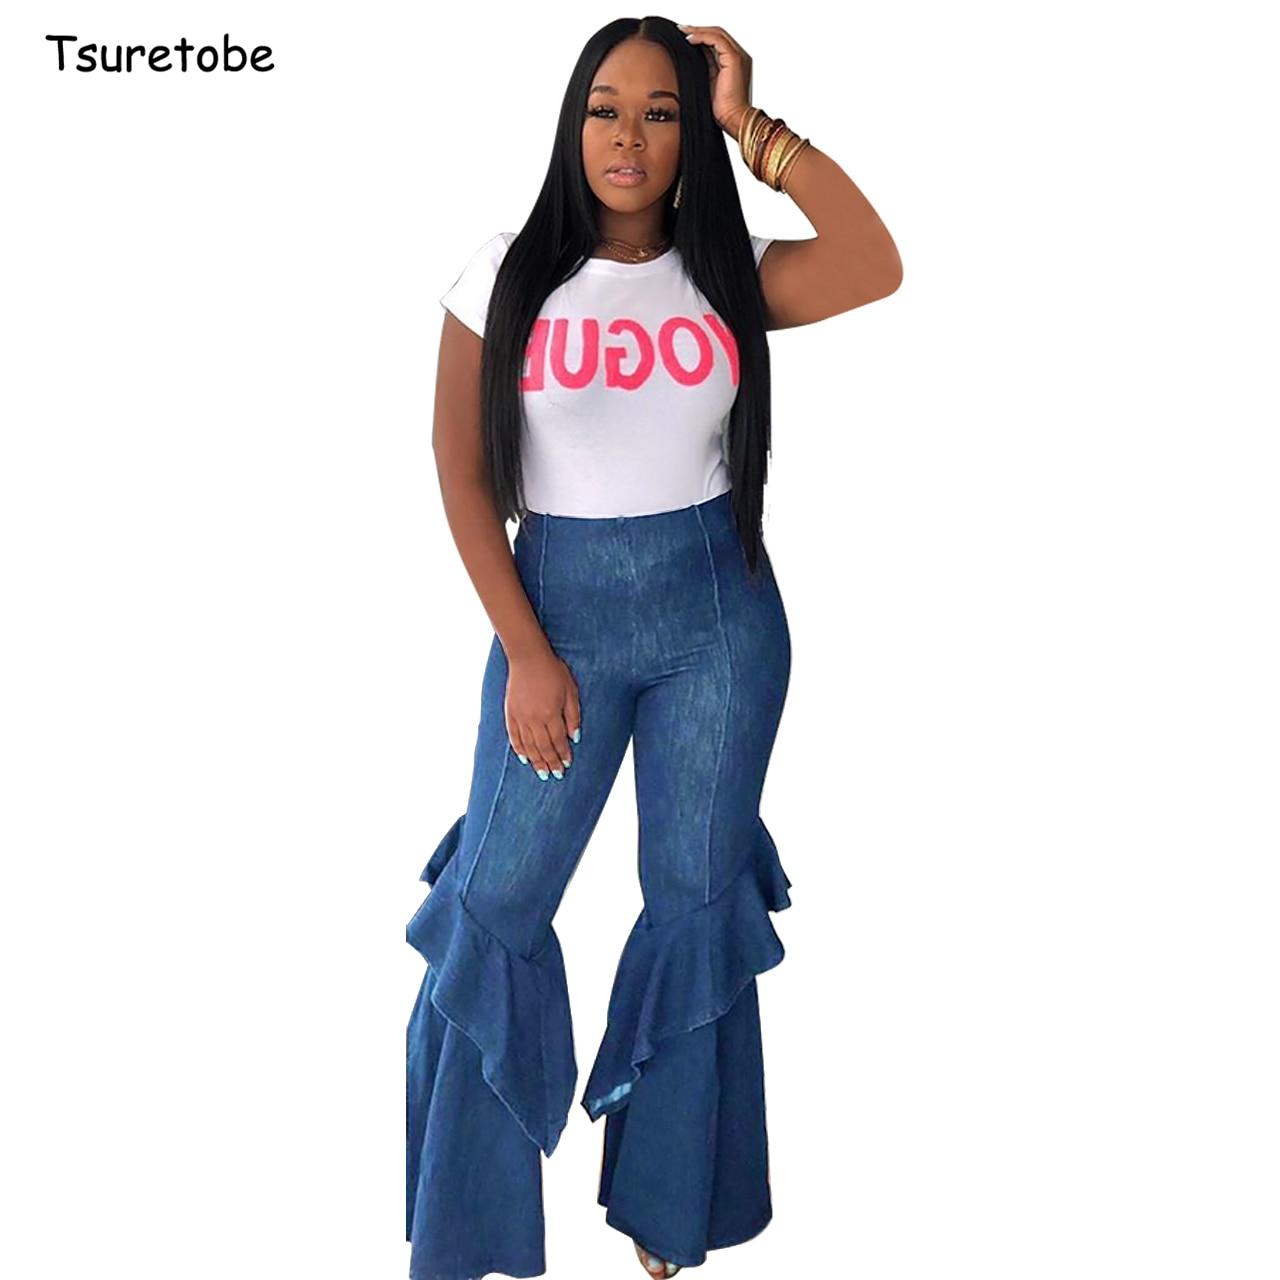 Tsuretobe Fashion Denim Flare Pants Cascading Ruffle Women Vintage High Waist   Jean   Trousers Lady Casual Bell-Bottoms Flare Pant